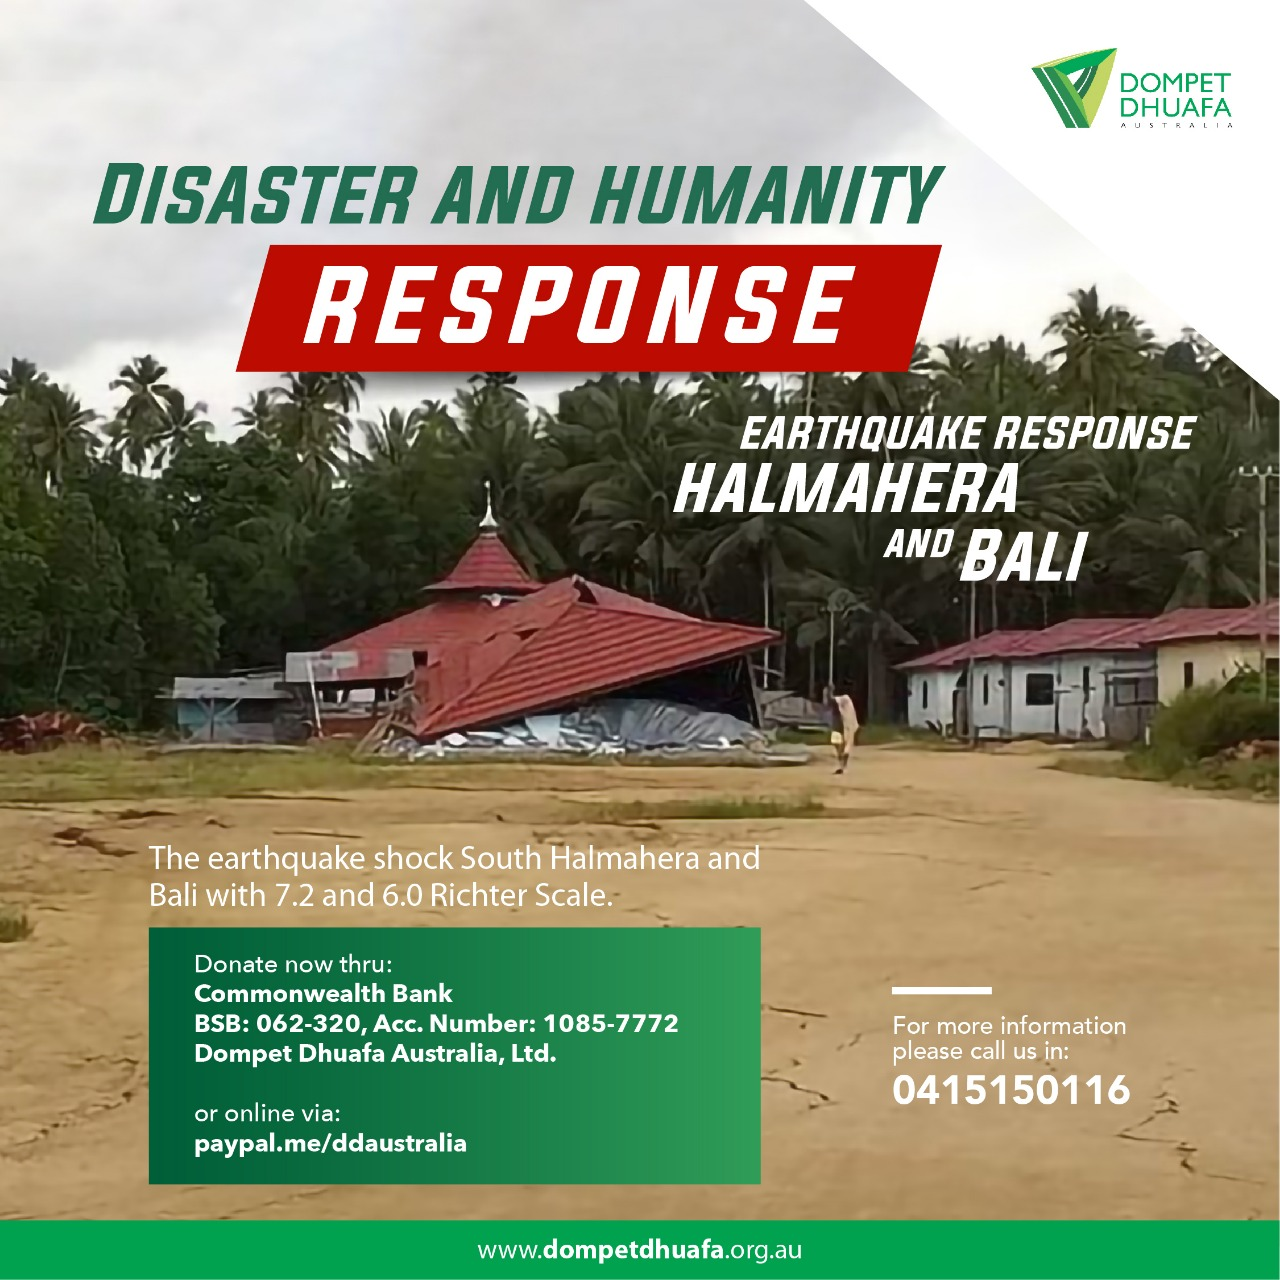 Earthquake Response Halmahera And Bali Dompet Dhuafa